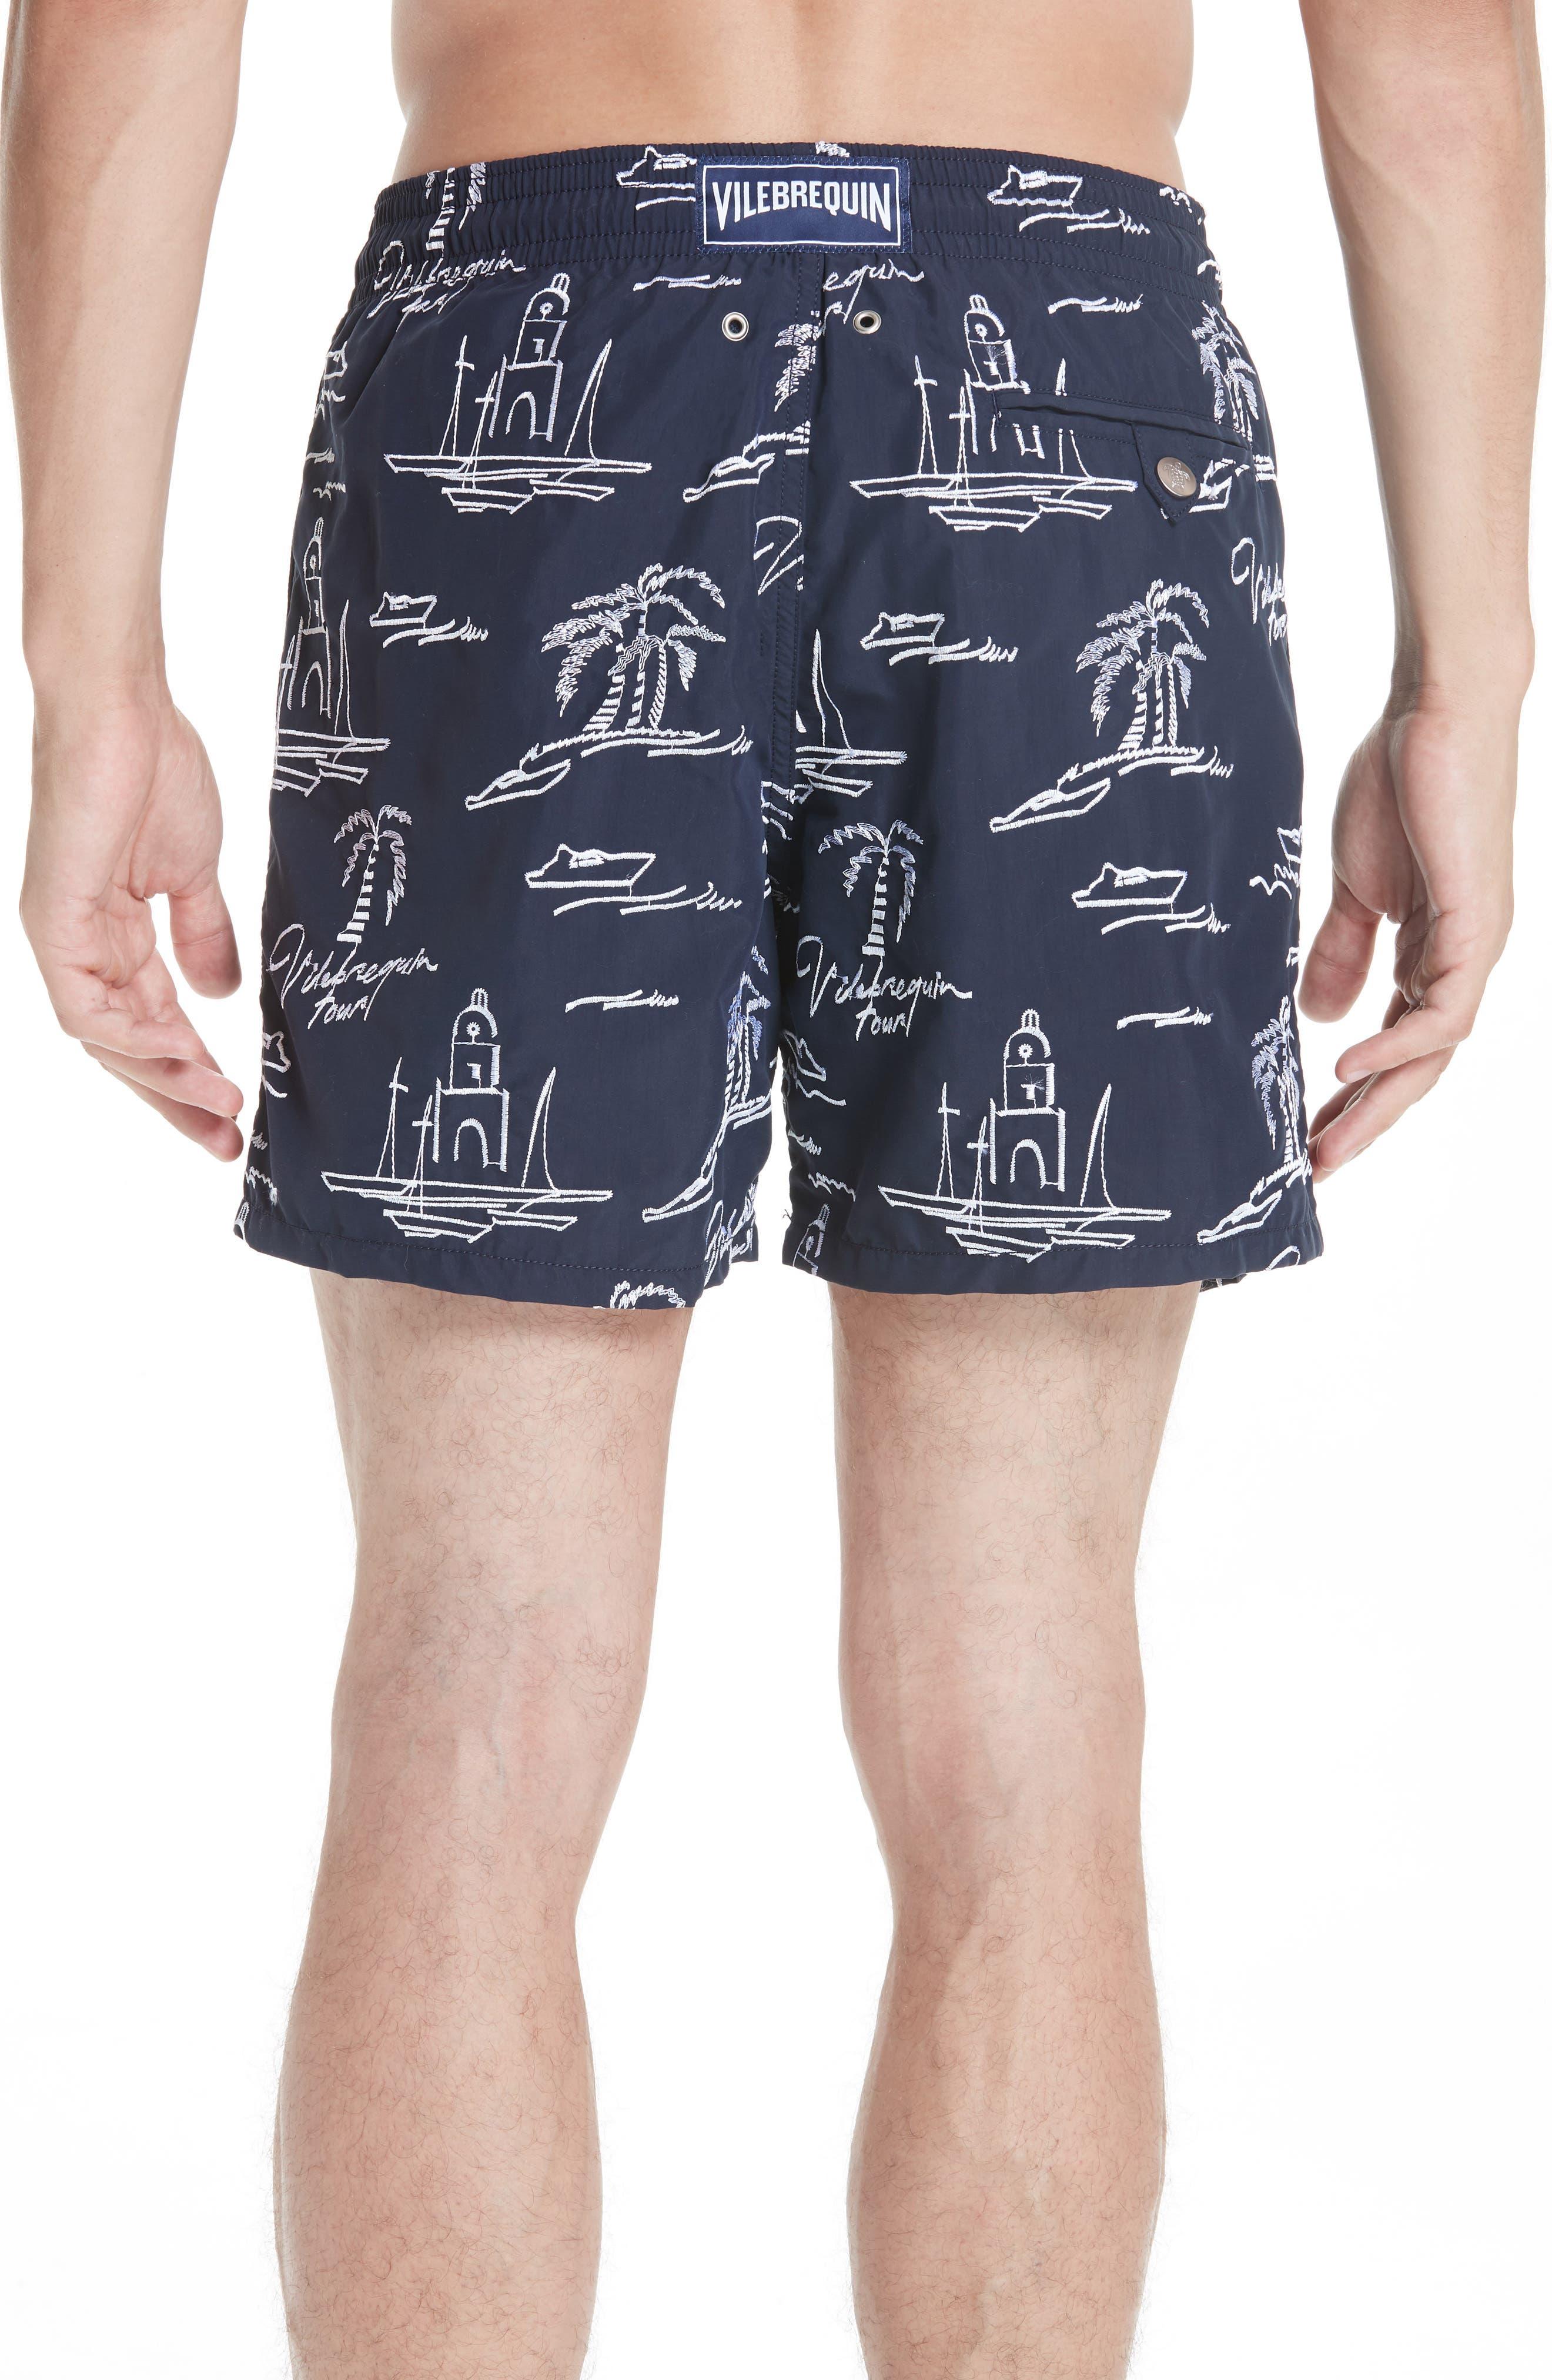 VILEBREQUIN,                             St. Tropez Embroidered Swim Trunks,                             Alternate thumbnail 2, color,                             BLUE